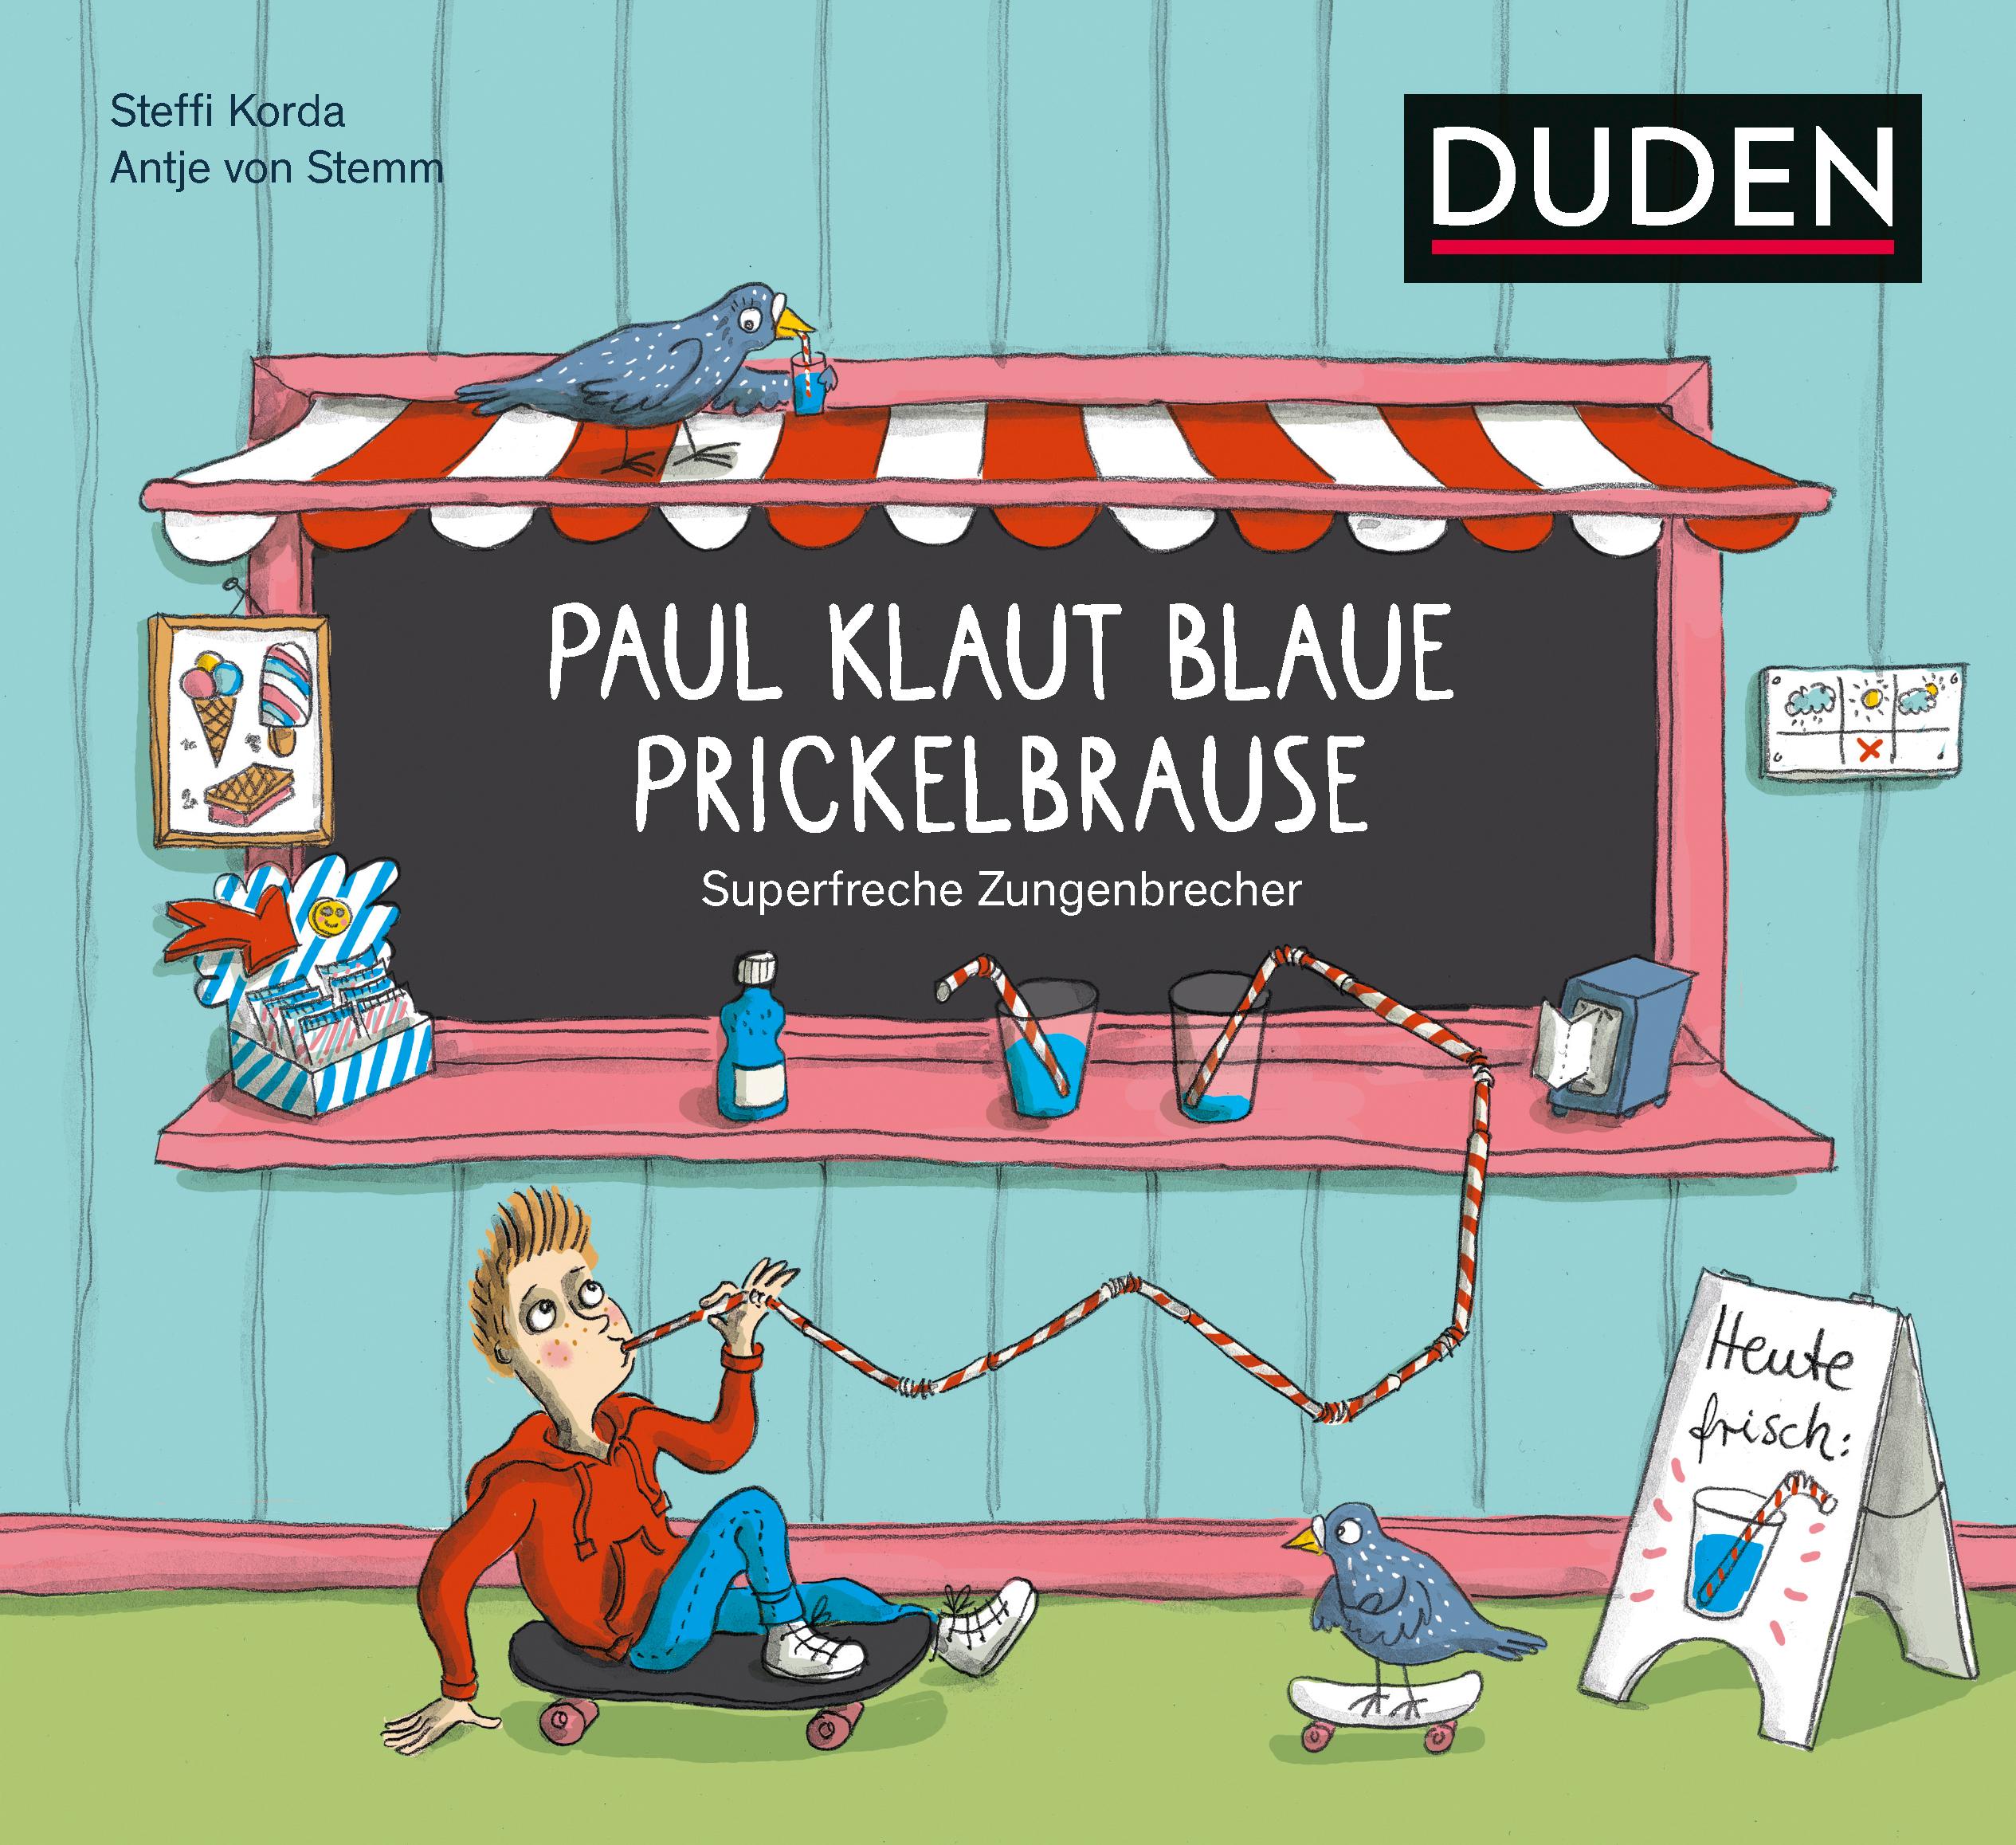 Buchcover: Paul klaut blaue Prickelbrause